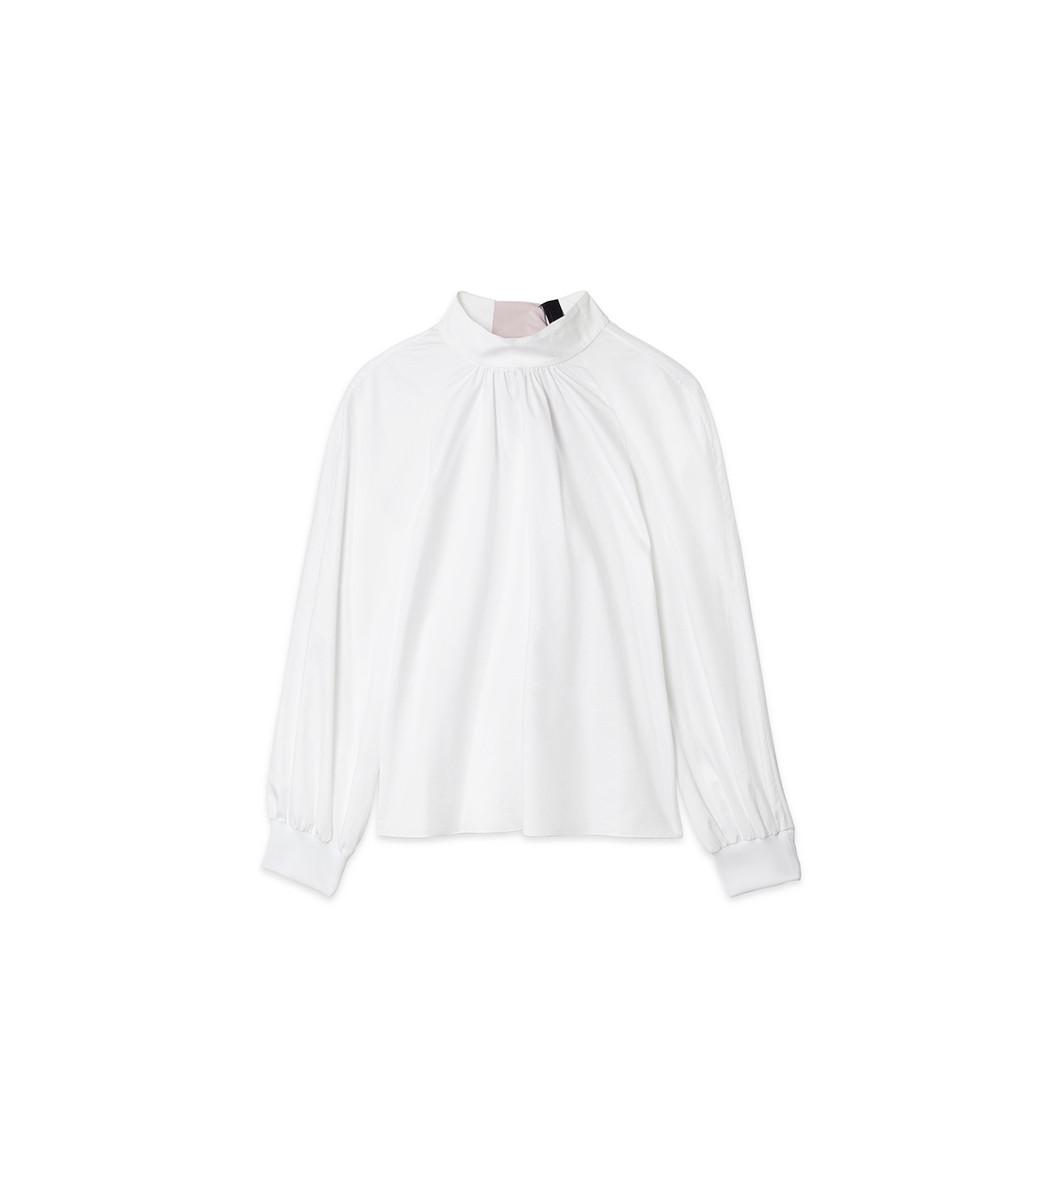 fd1a92b049d6 Tibi White Satin Poplin Shirred Neck Top With Contrast Tie